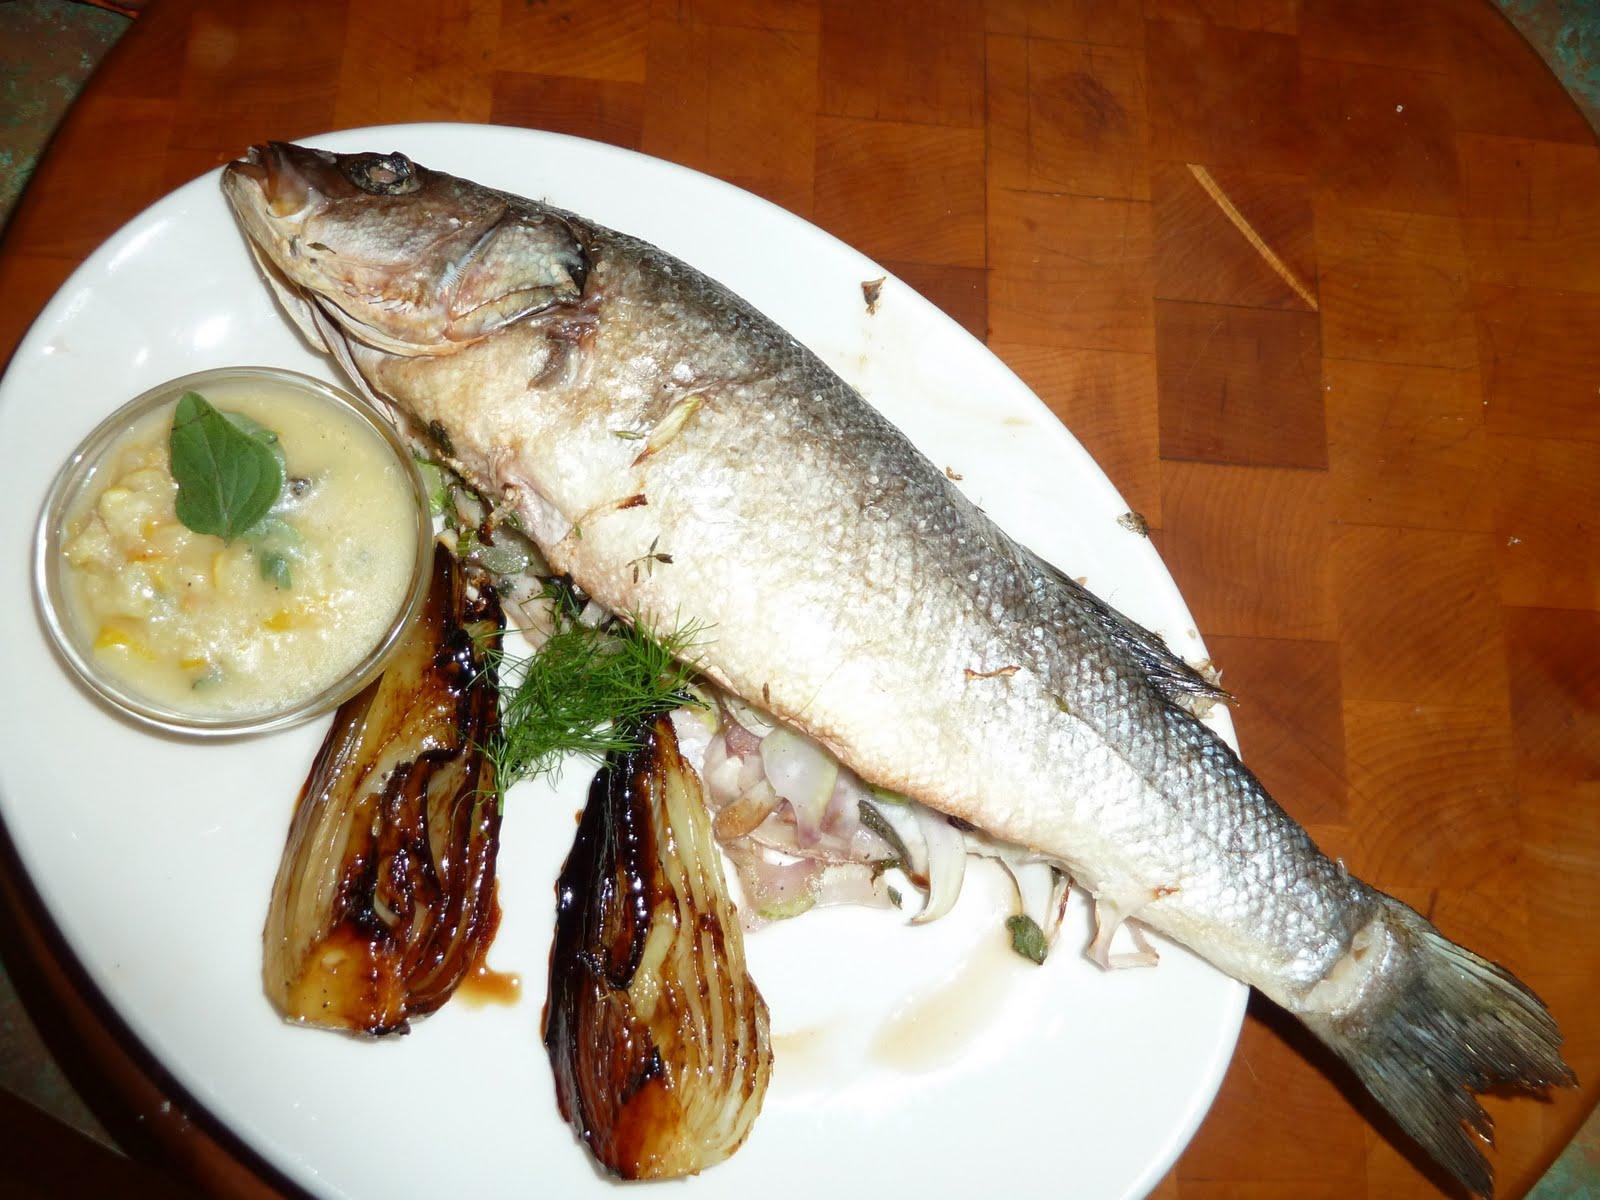 Gastroblog whole roasted branzino for What is branzino fish